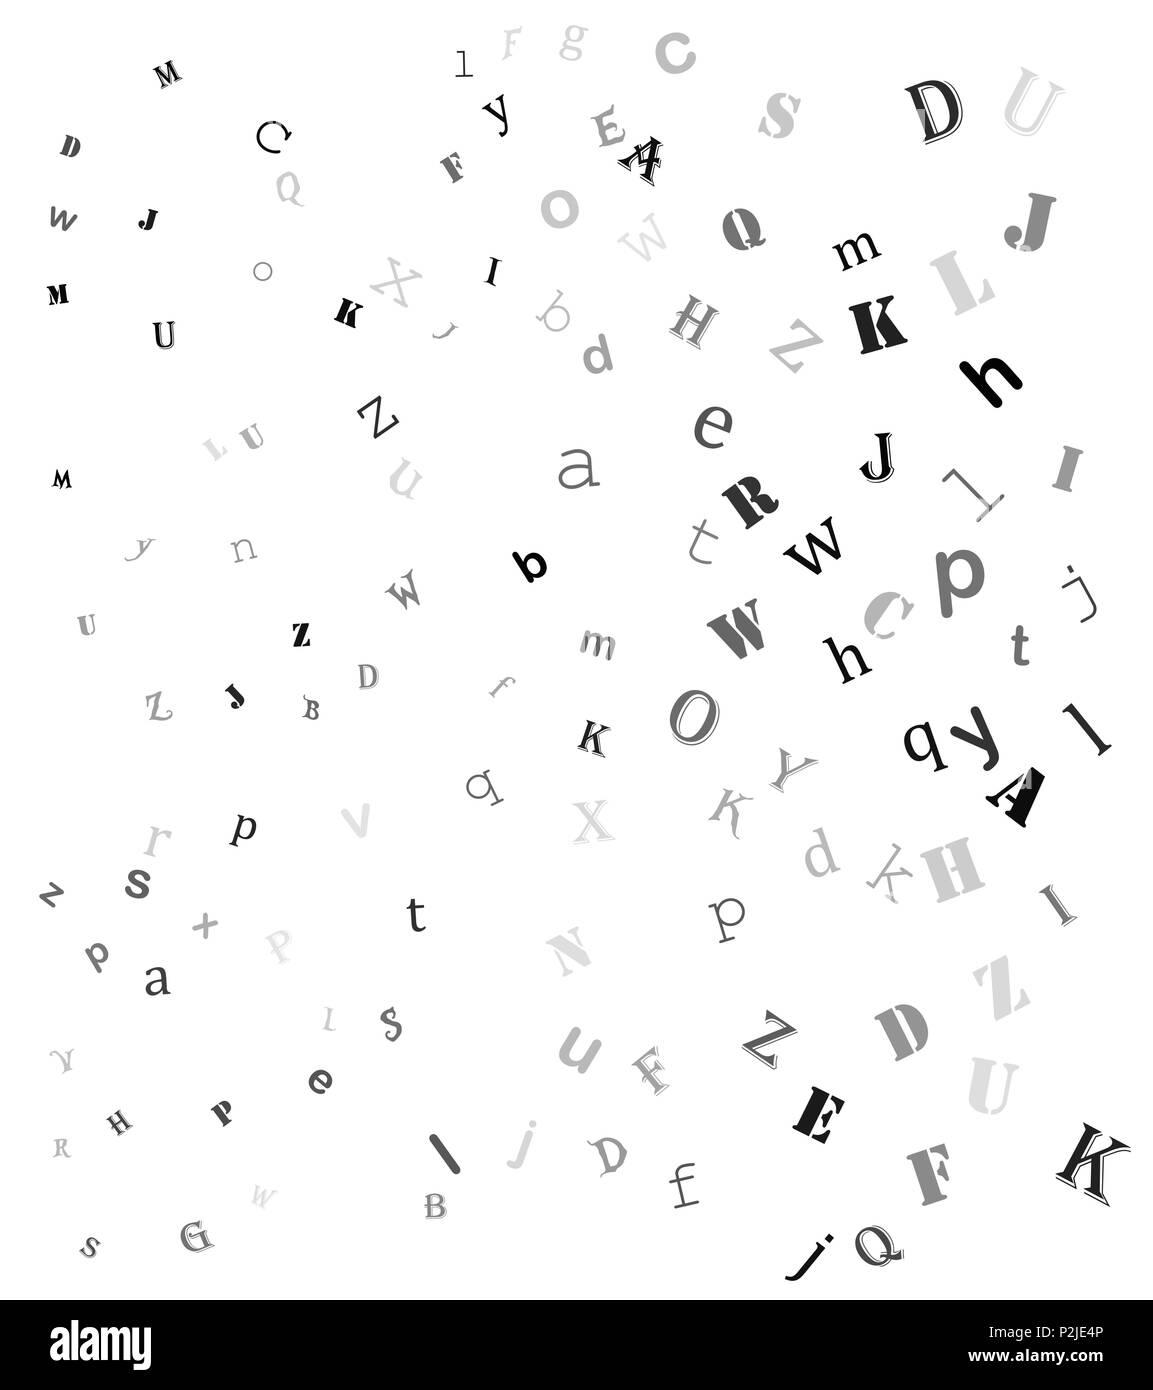 Falling Random Letters Alphabet Beautiful Background Design Stock